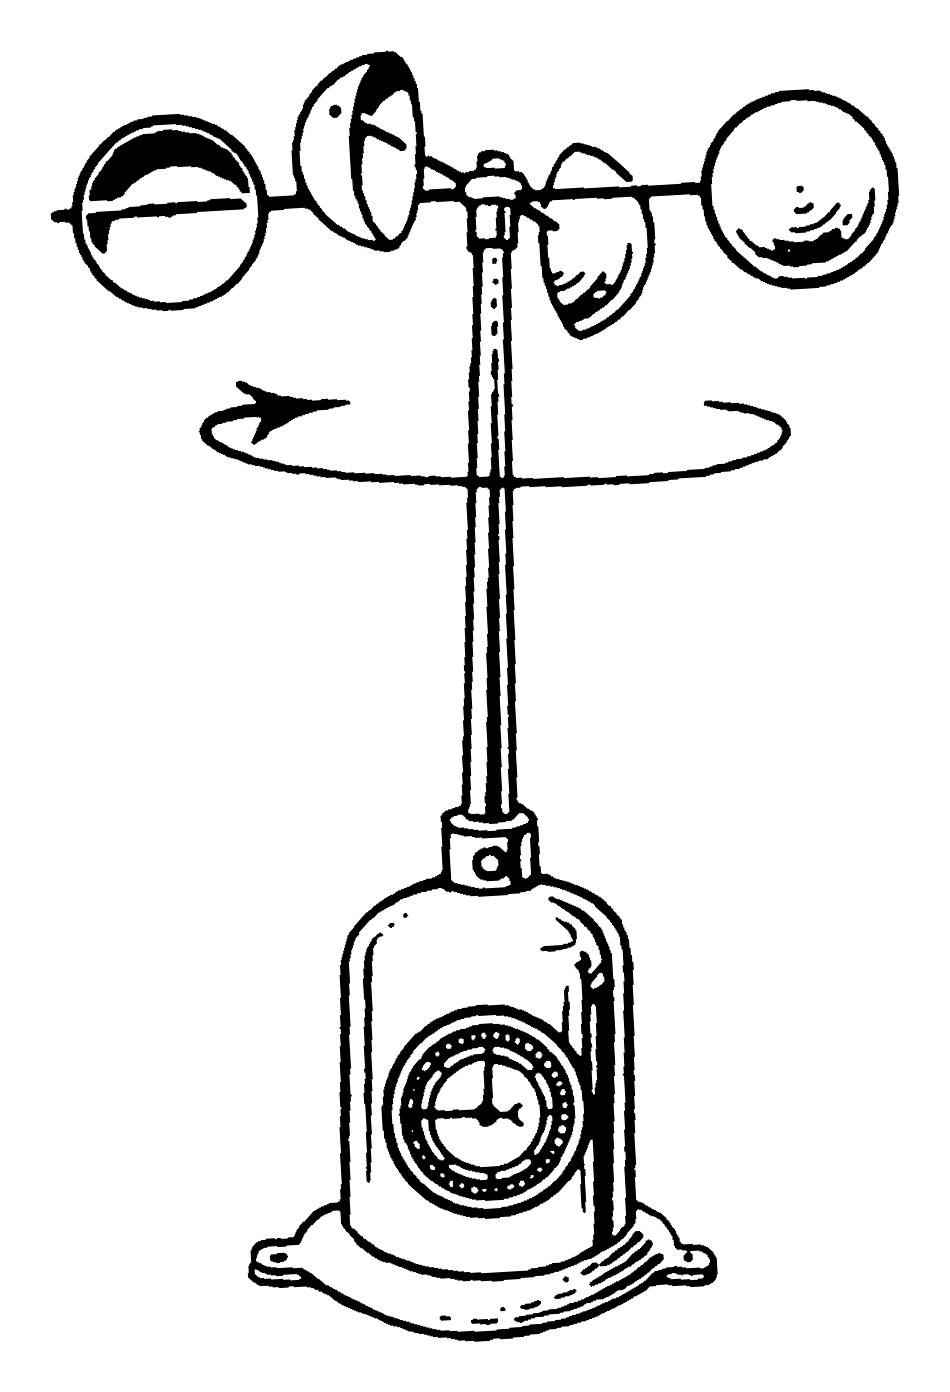 anemometer drawing -#main